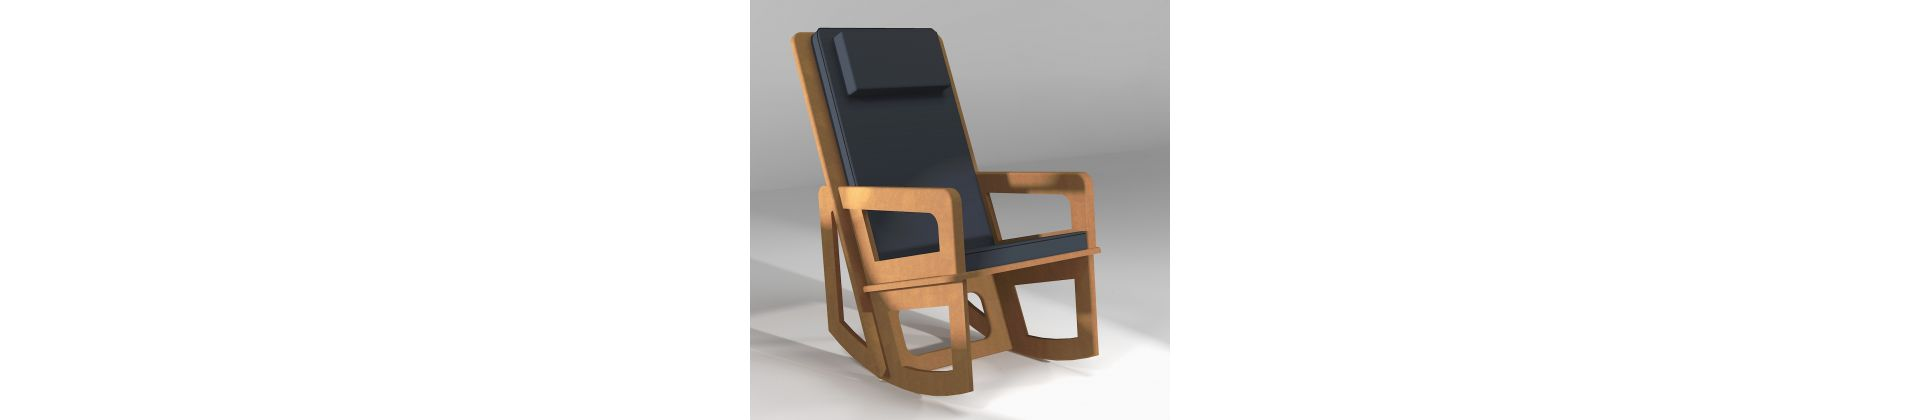 Rocking chair for elderly